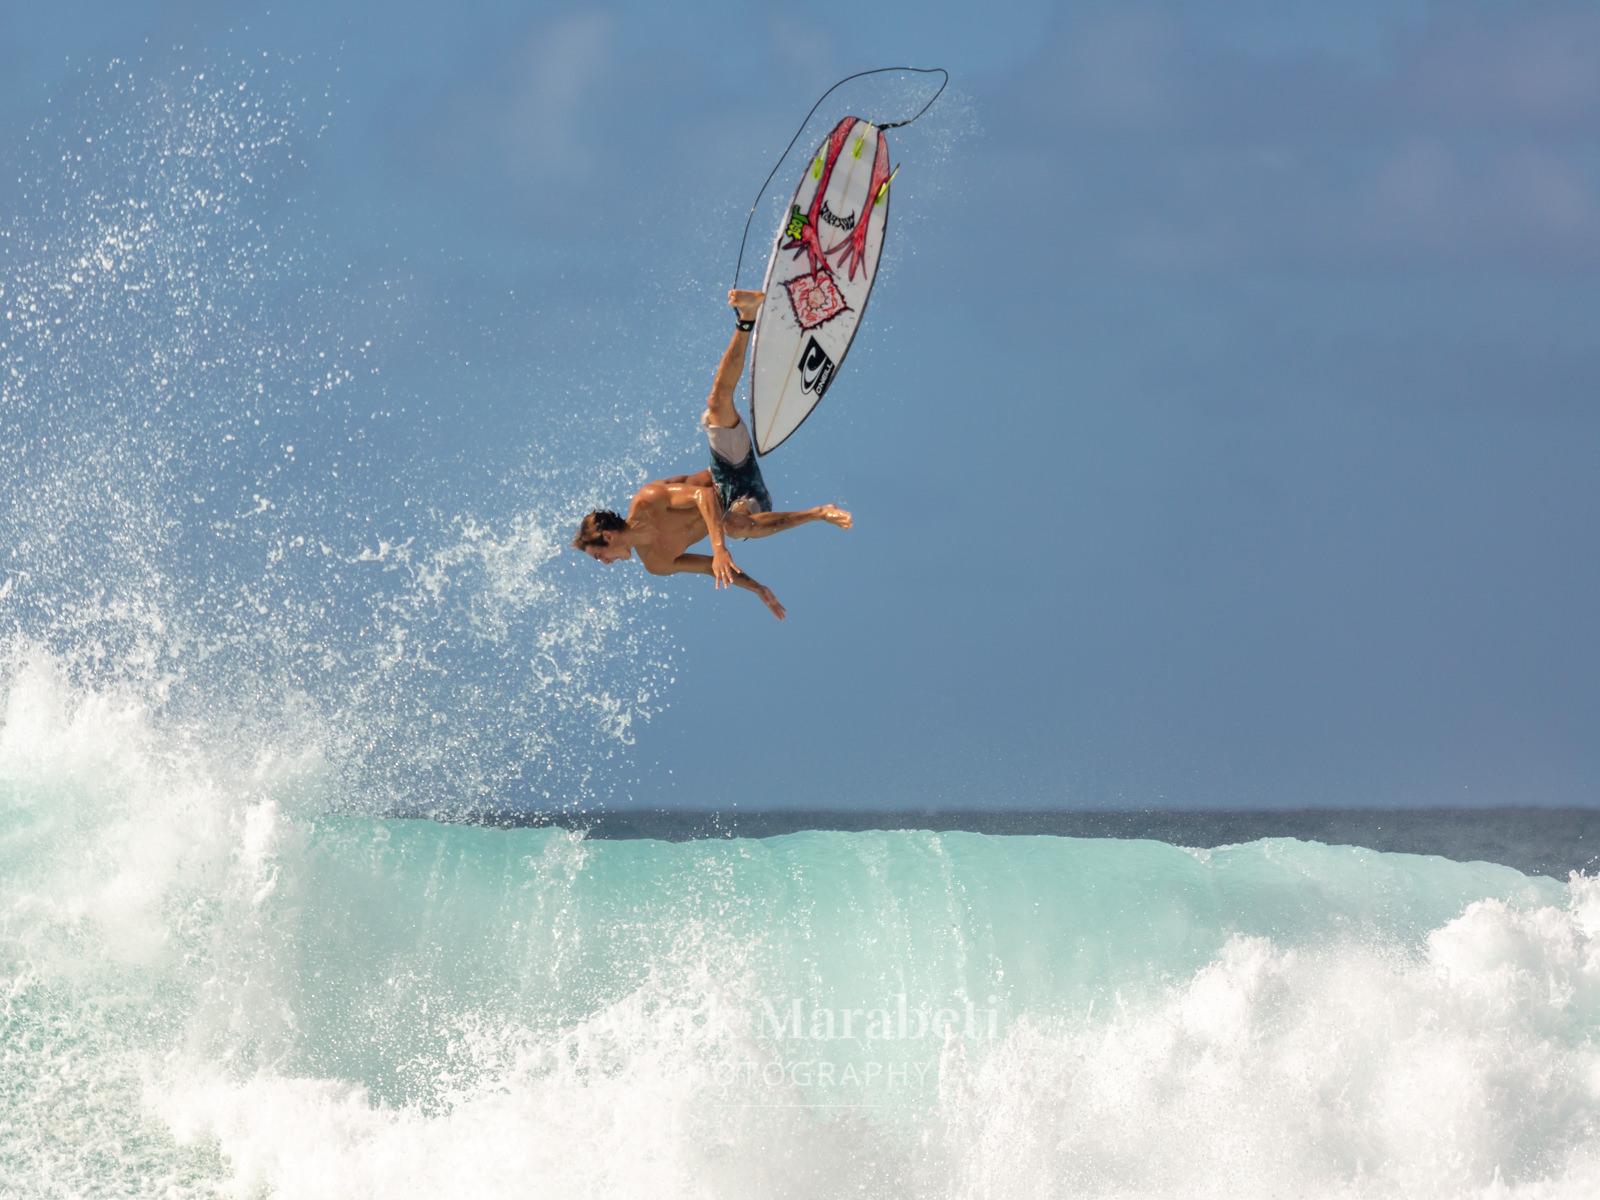 Mark Marabeti Photography - North Shore Oahu-0018.jpg